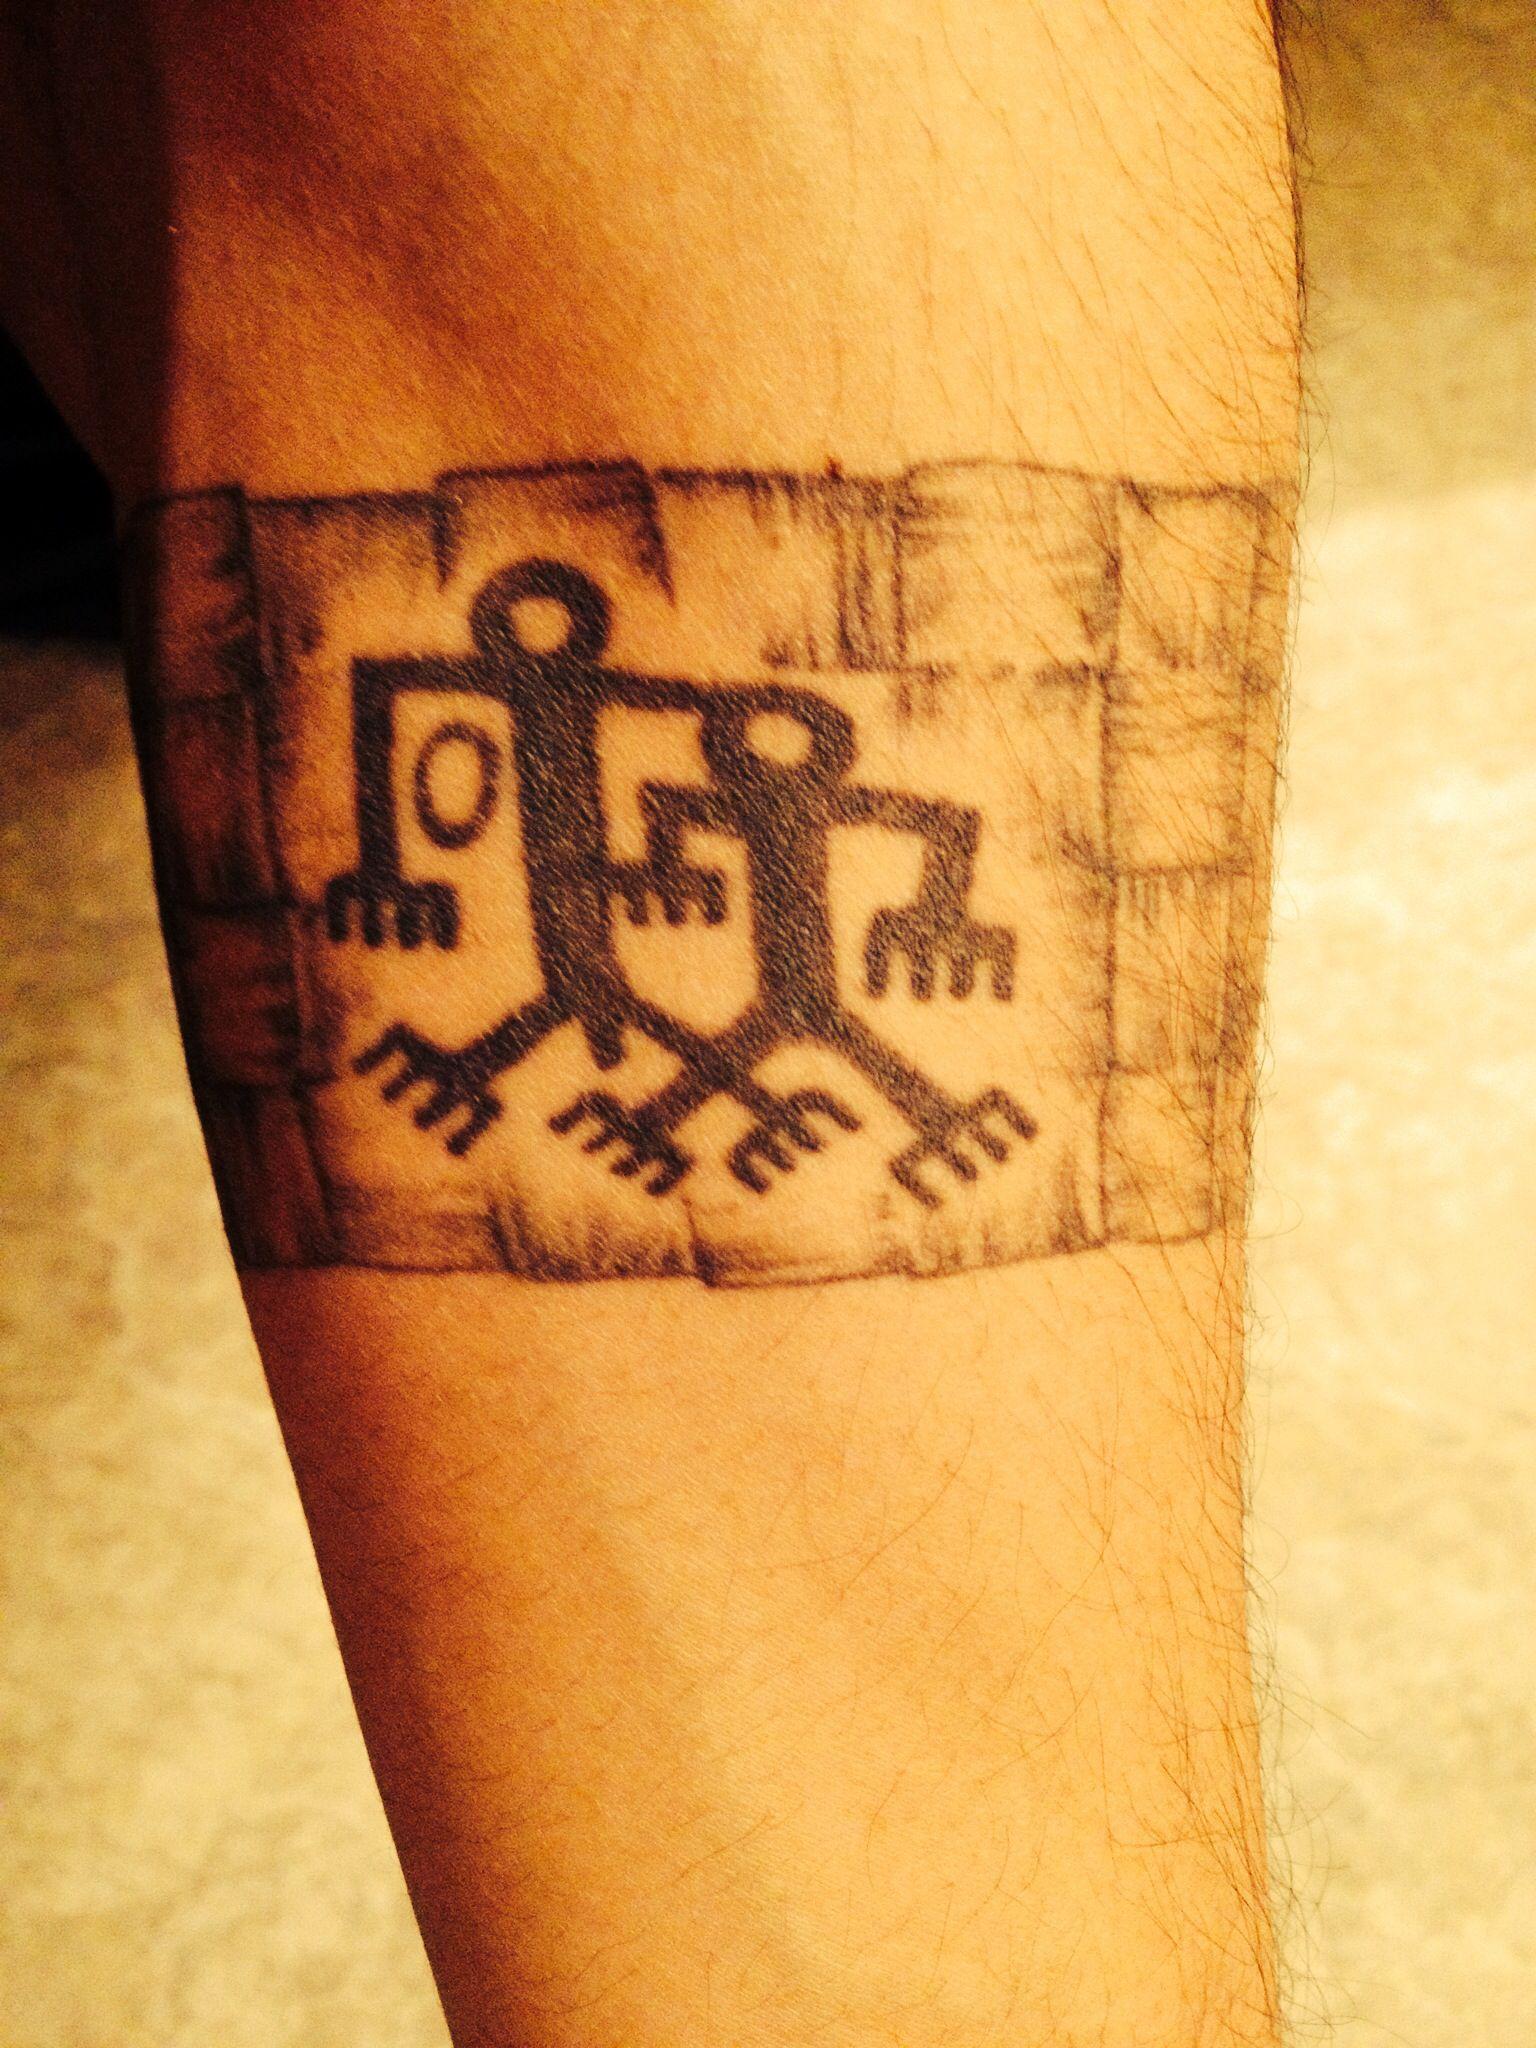 Forearm Chamorro band tattoo | Tattoos | Pinterest | Band ...  Forearm Chamorr...